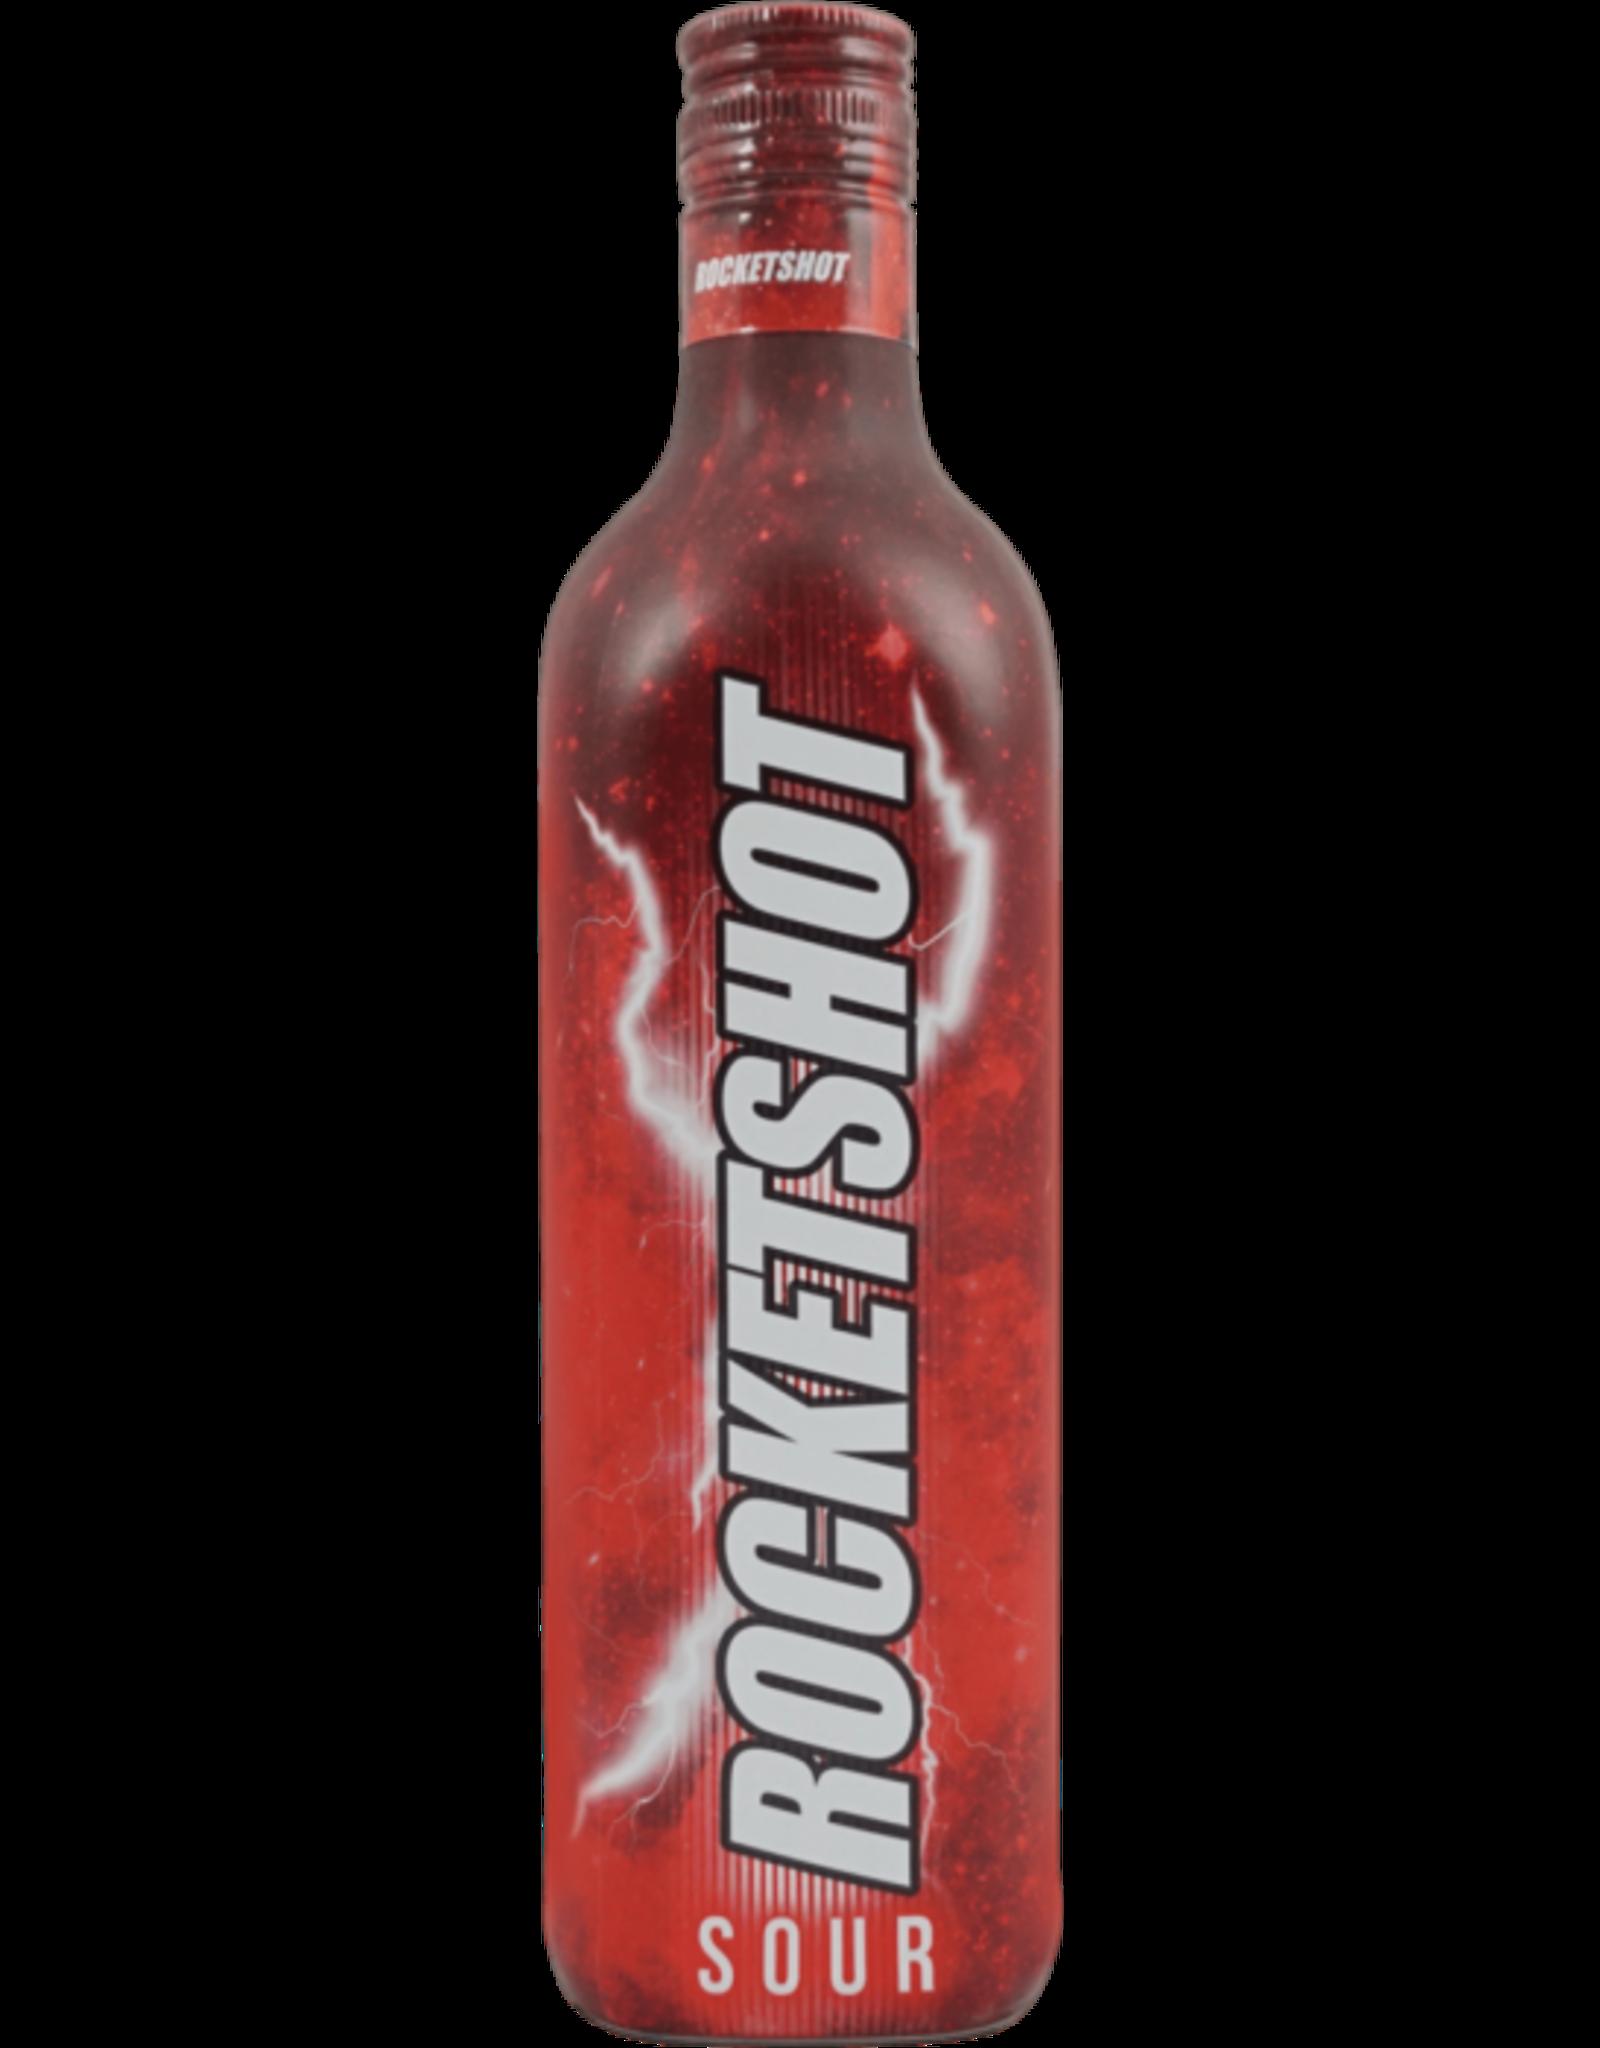 Rocketshot Rocketshot Sour 70cl